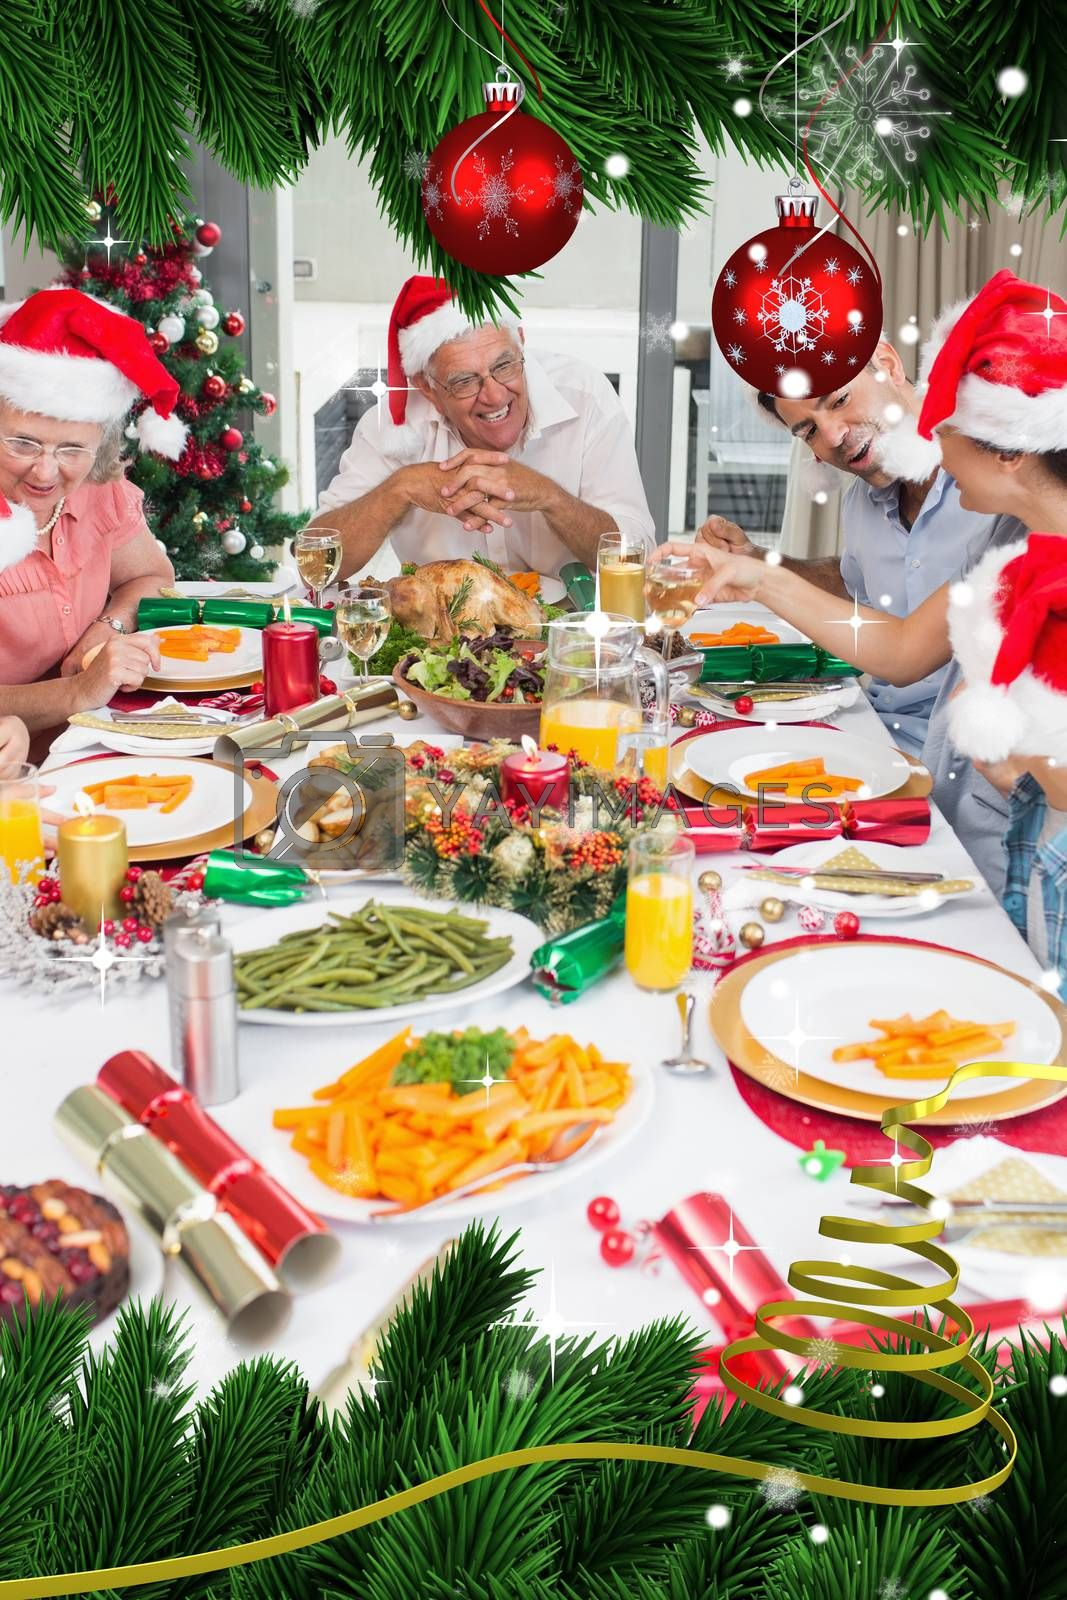 Happy family in santas hats enjoying christmas dinner by Wavebreakmedia